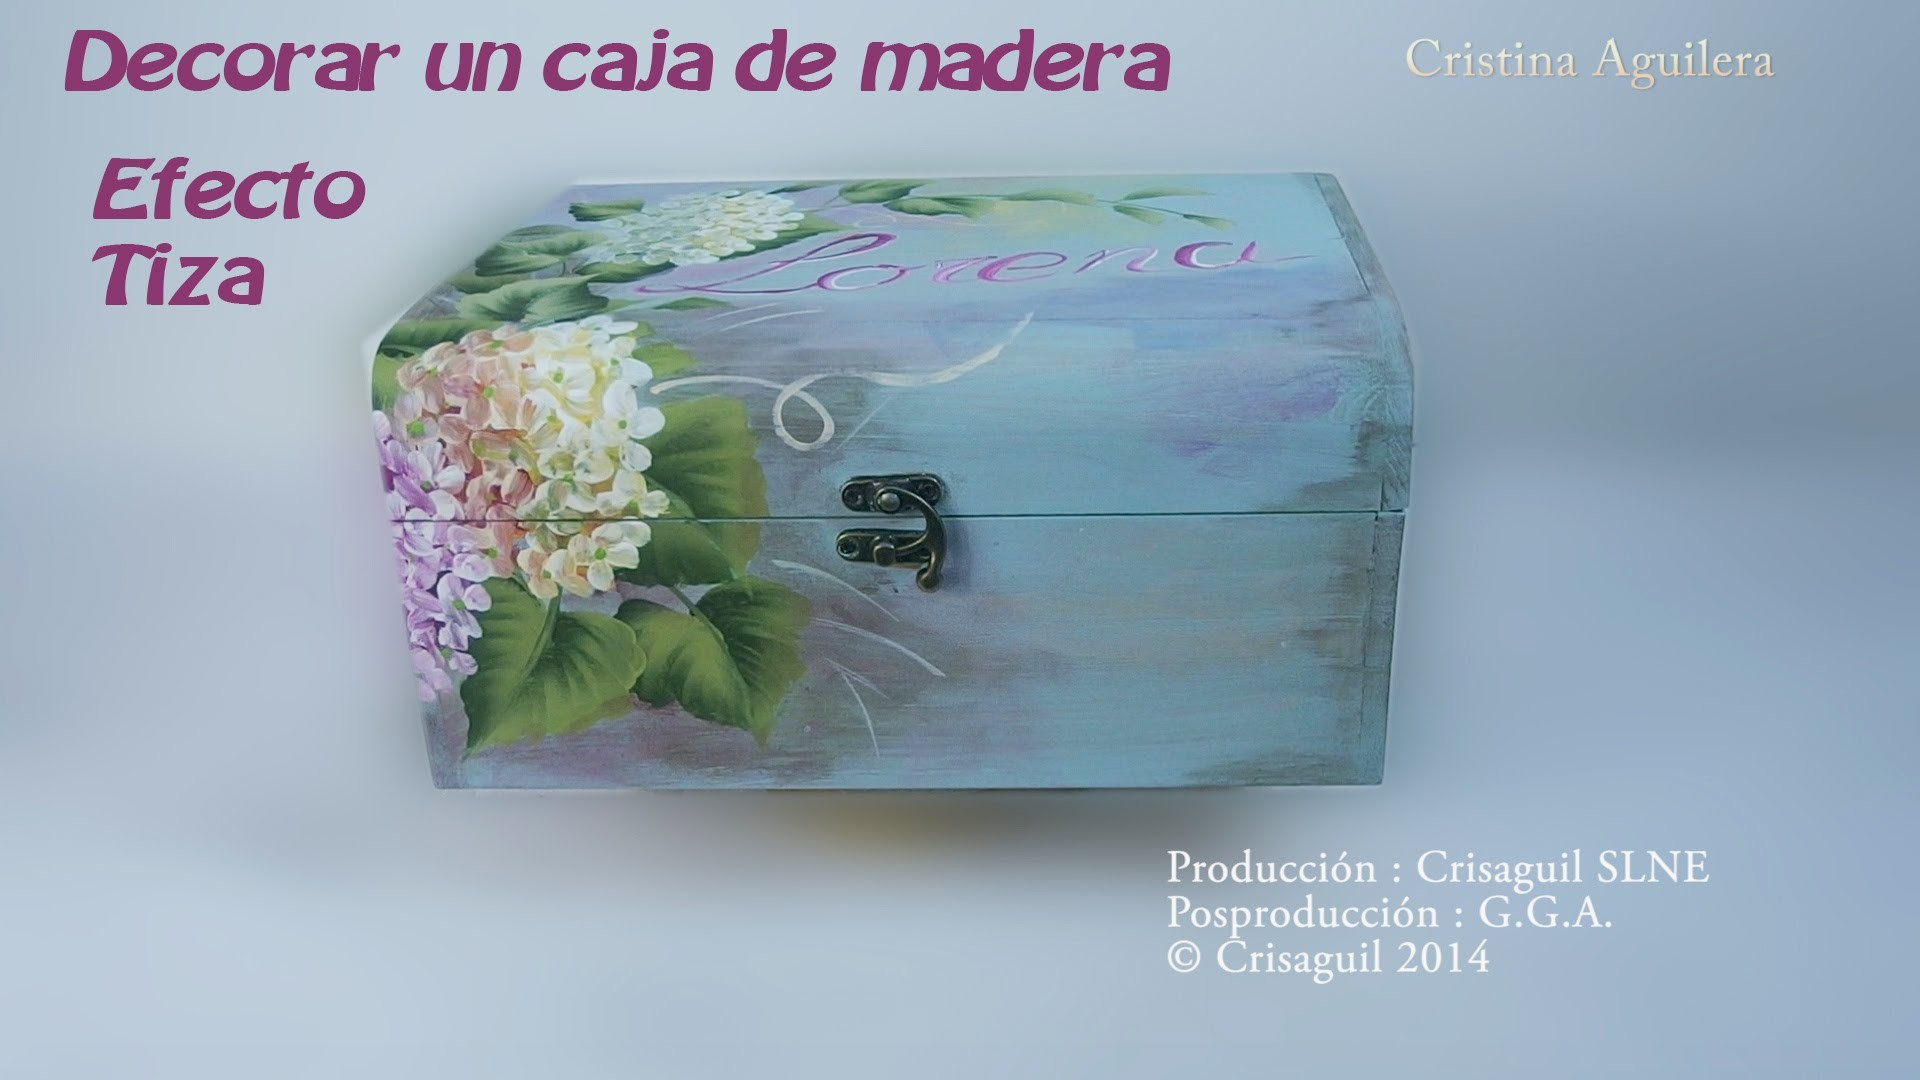 Pintar caja madera con pintura efecto tiza y multicarga .Painted wooden box one stroke